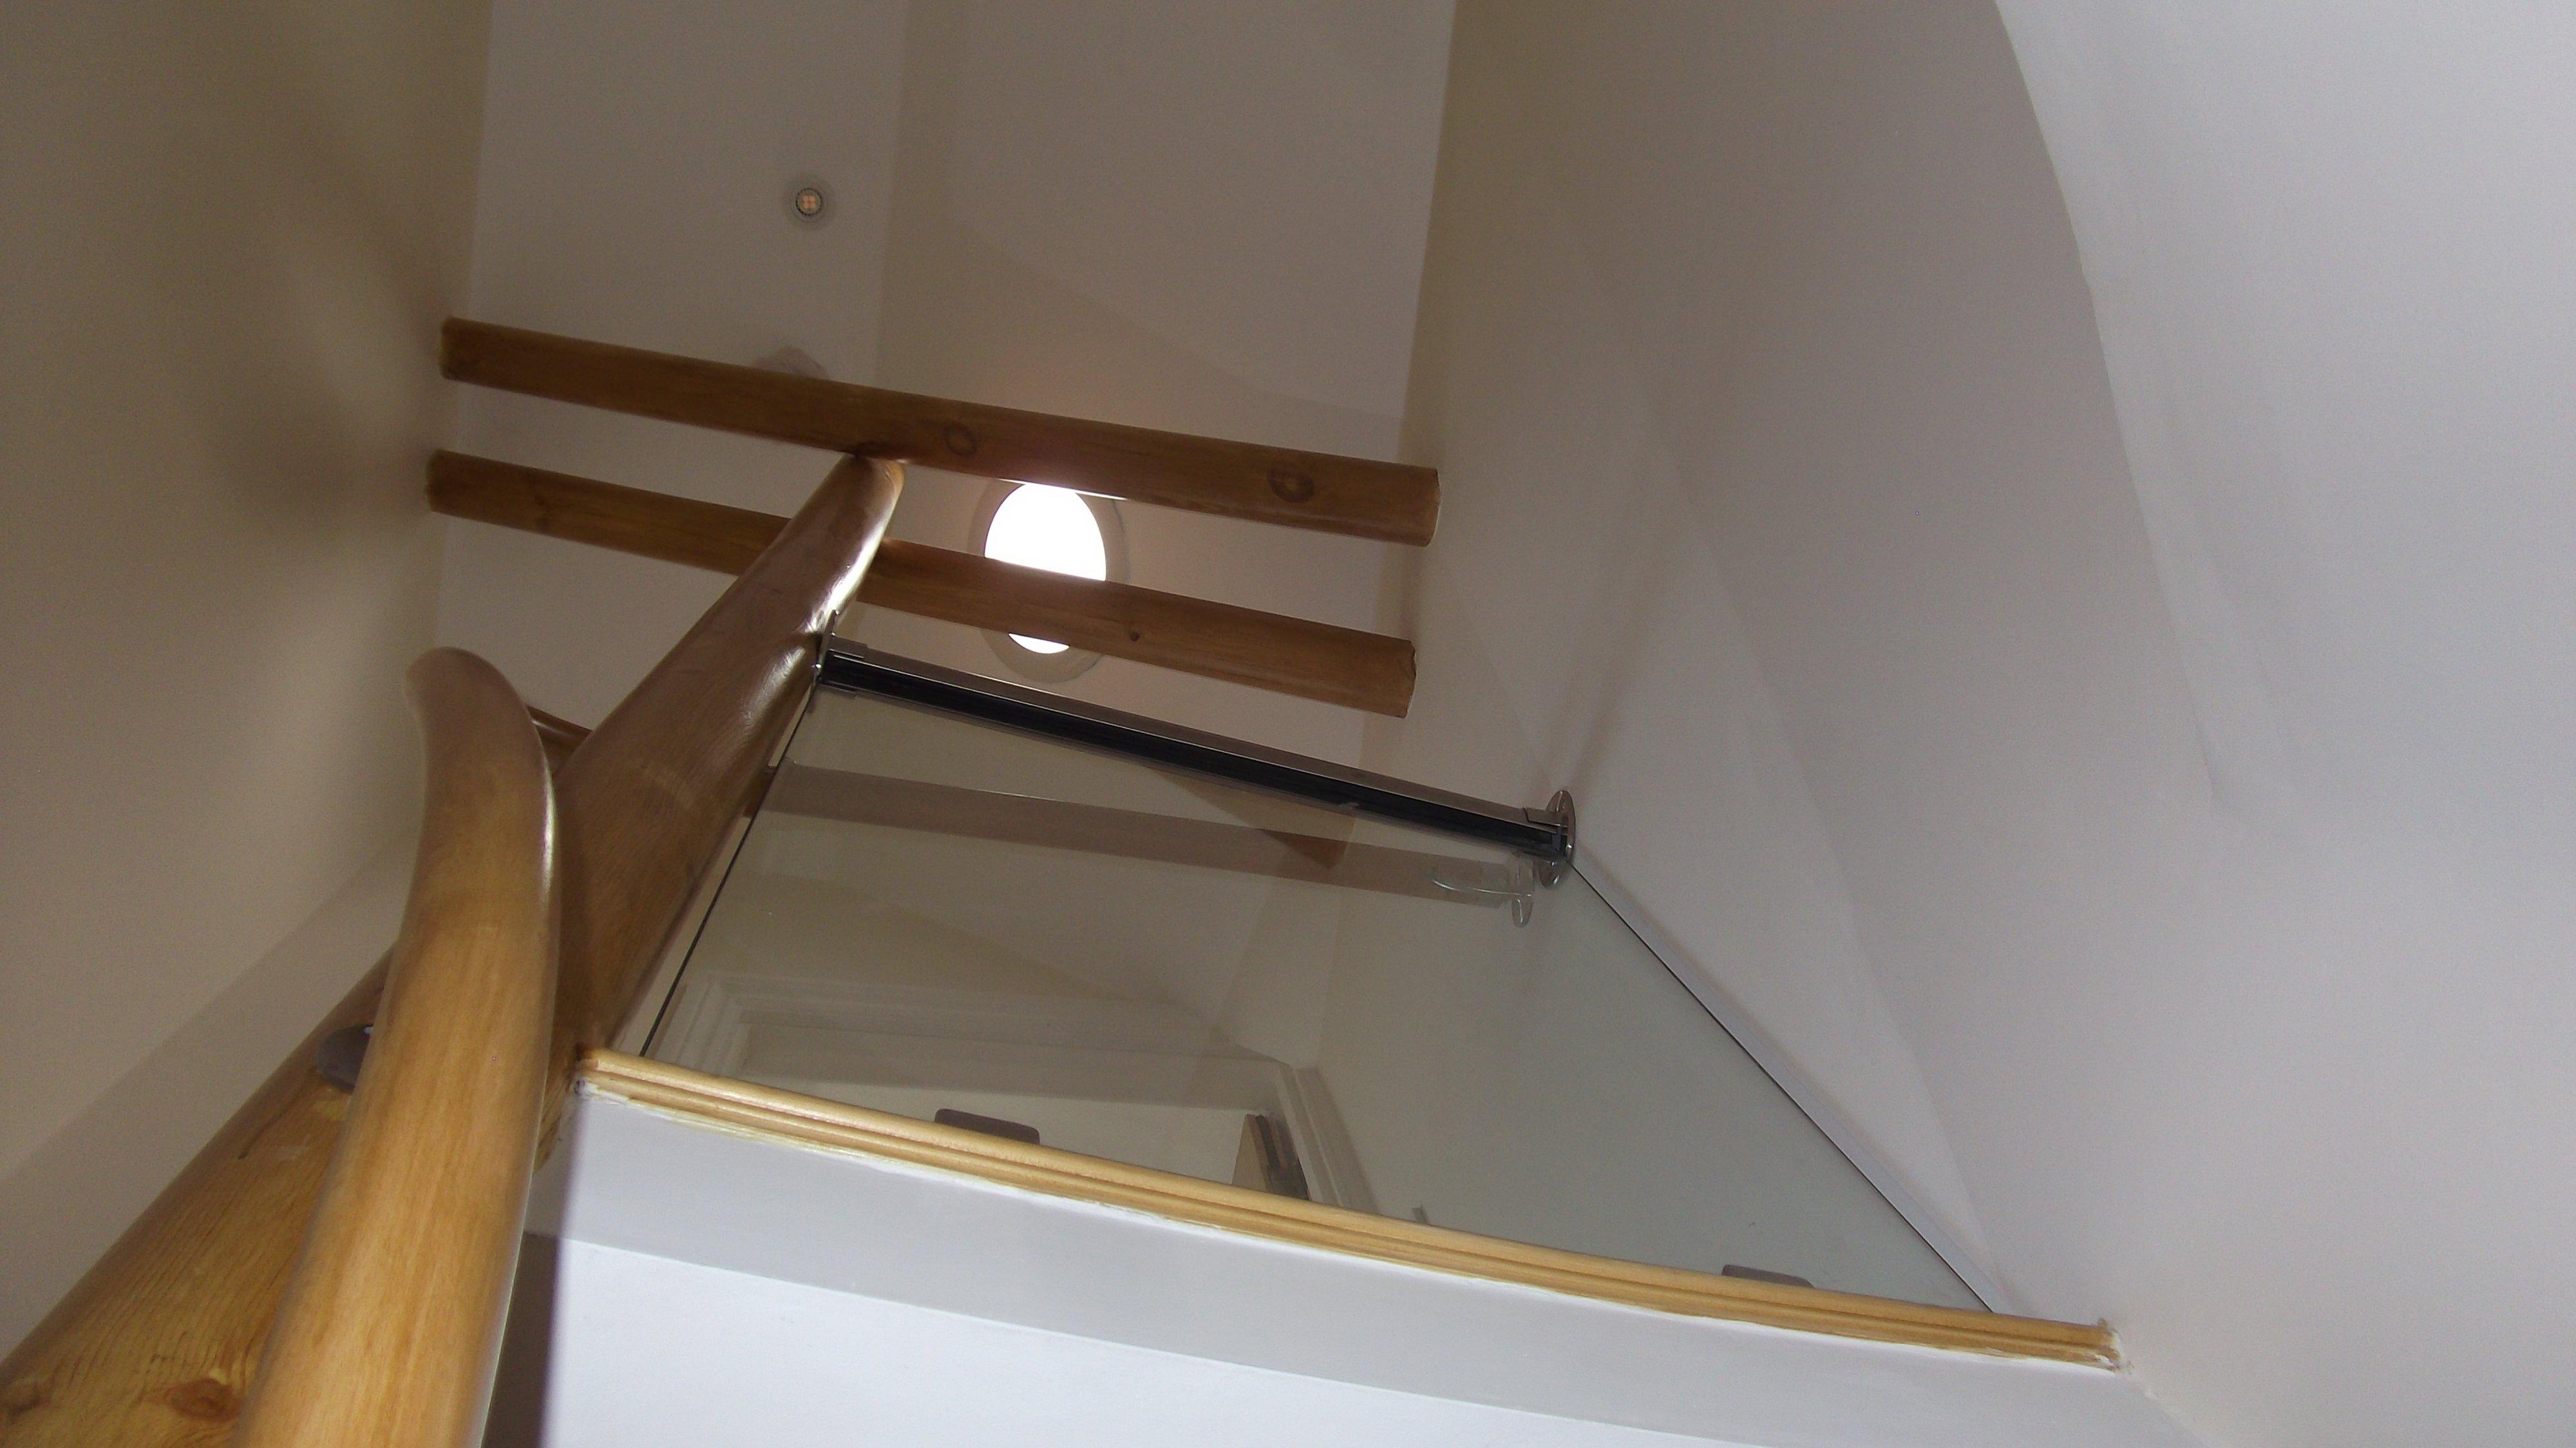 Loft stairwell with bendy rail